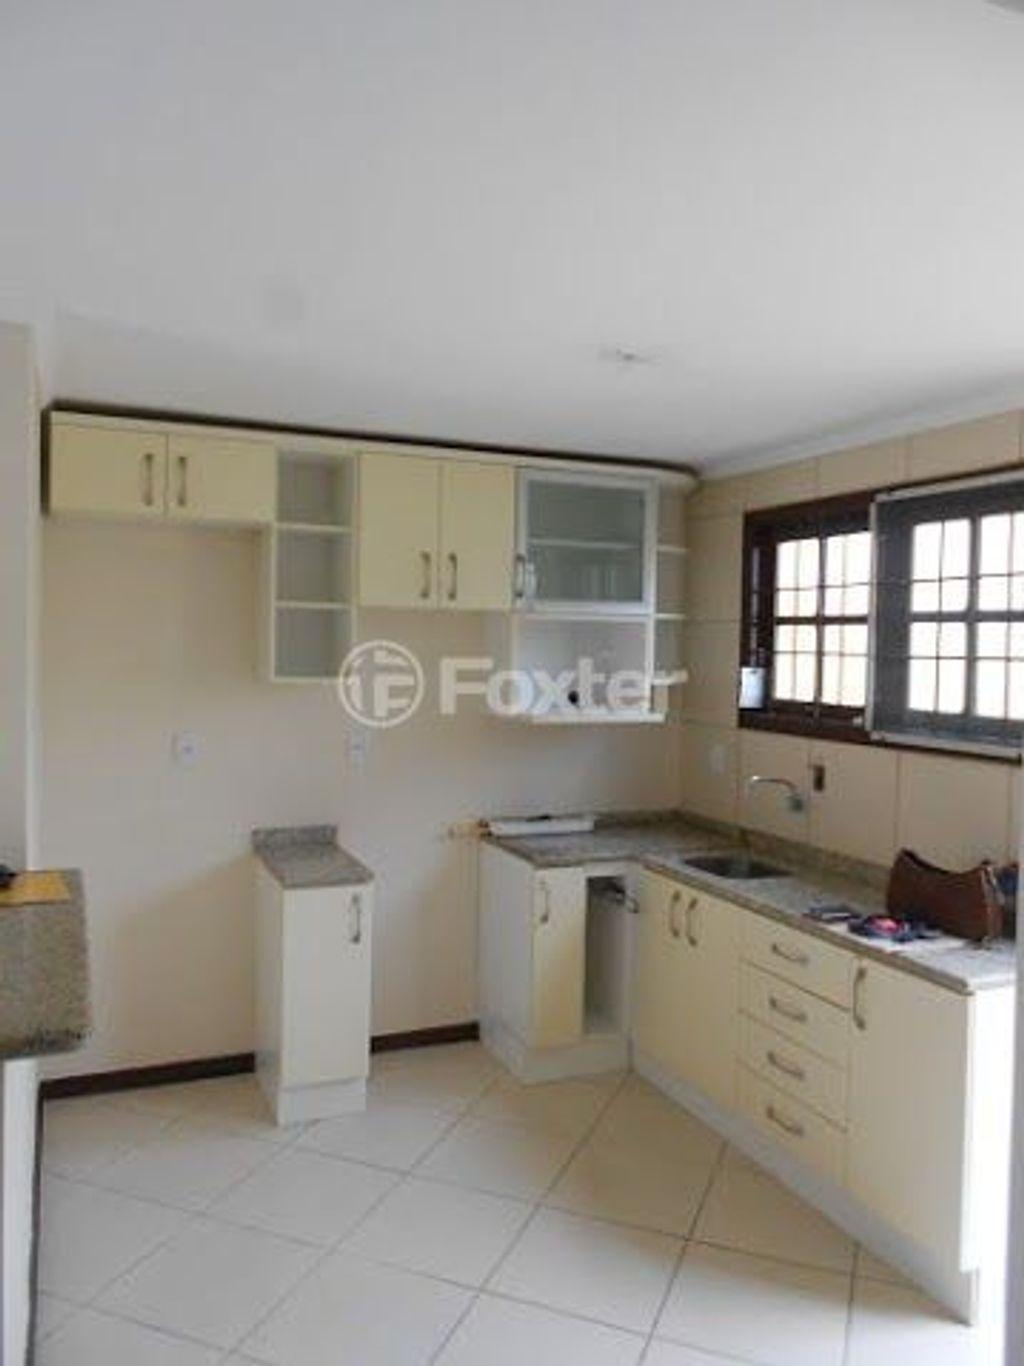 Casa 3 Dorm, Cavalhada, Porto Alegre (143368) - Foto 5